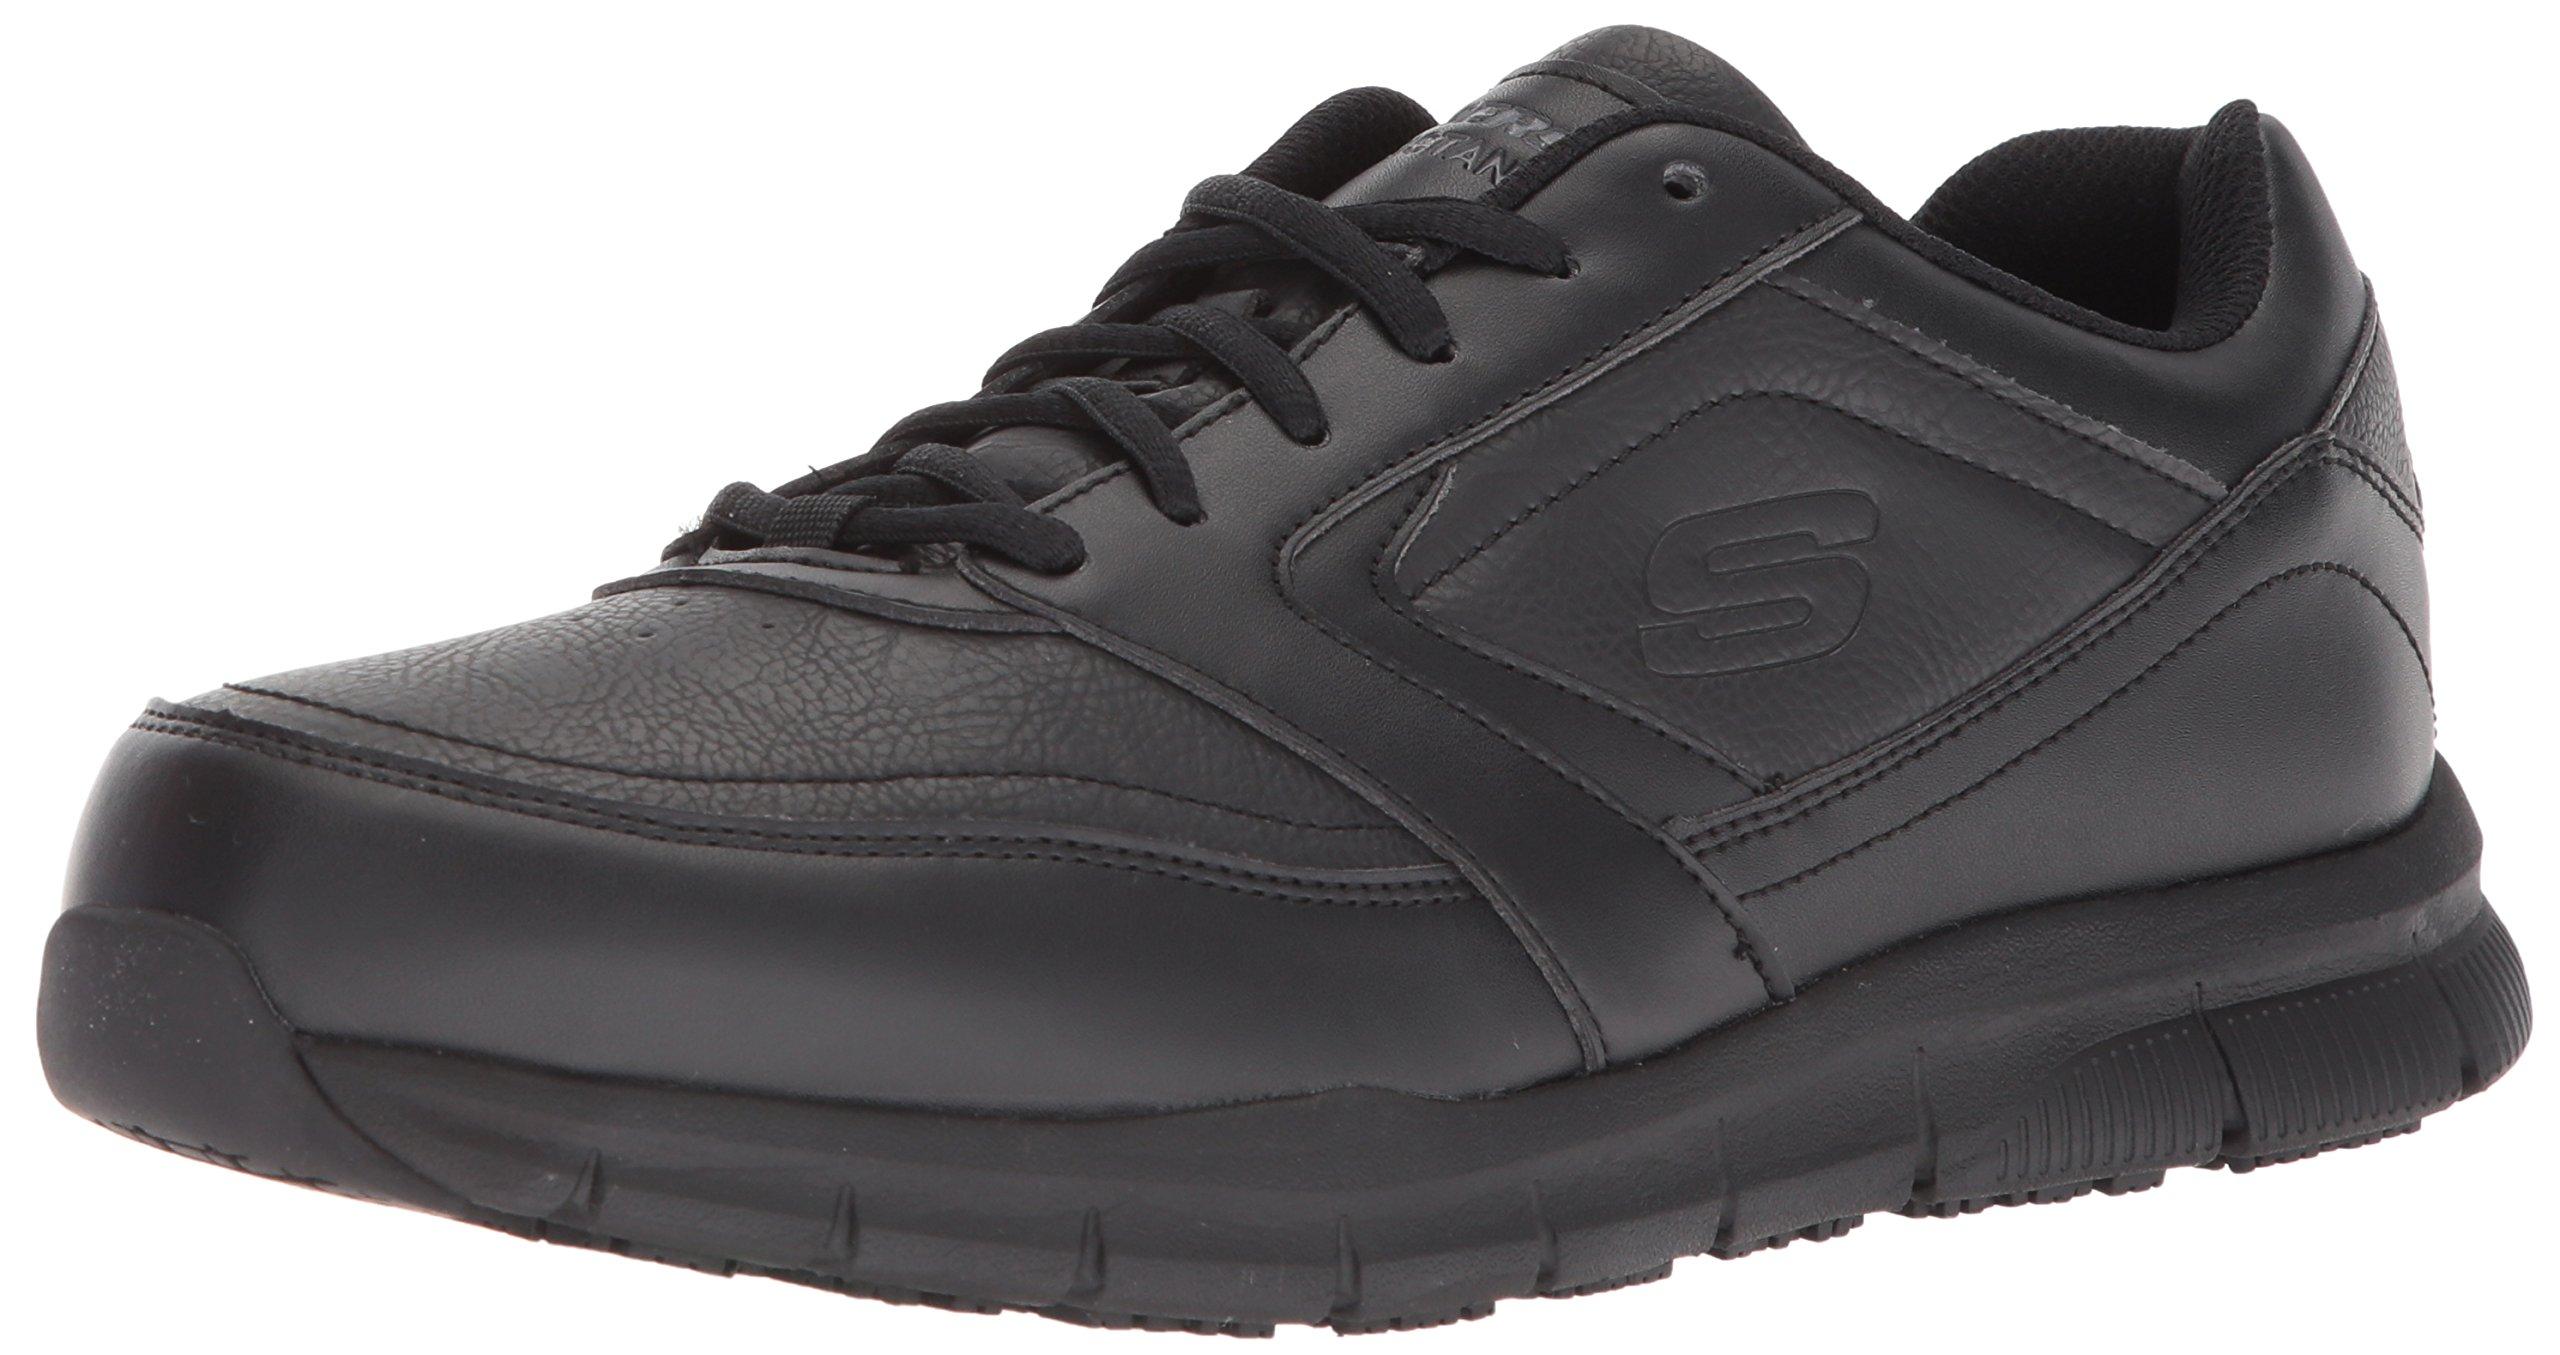 Skechers for Work Men's Nampa Food Service Shoe,Black Polyurethane,11 M US by Skechers